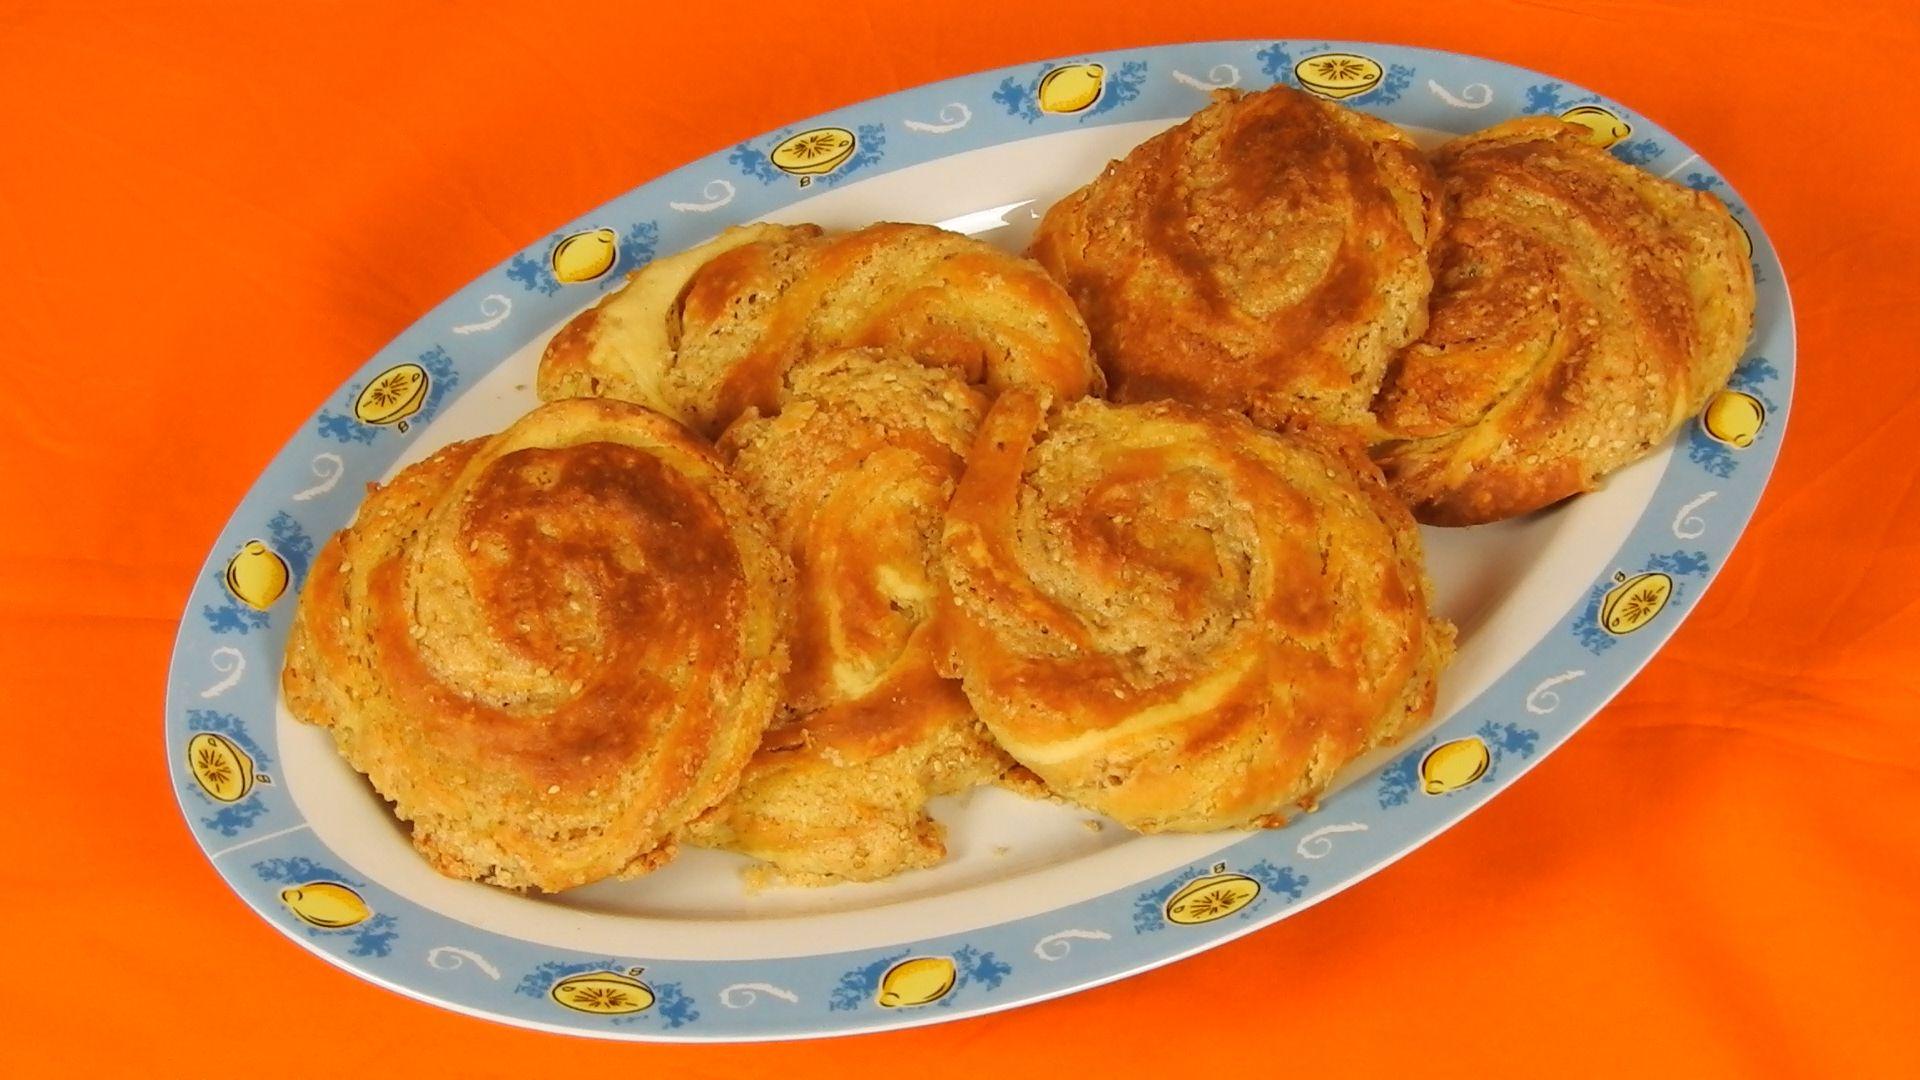 Cypriot Tahini Pies with Orange Flavor